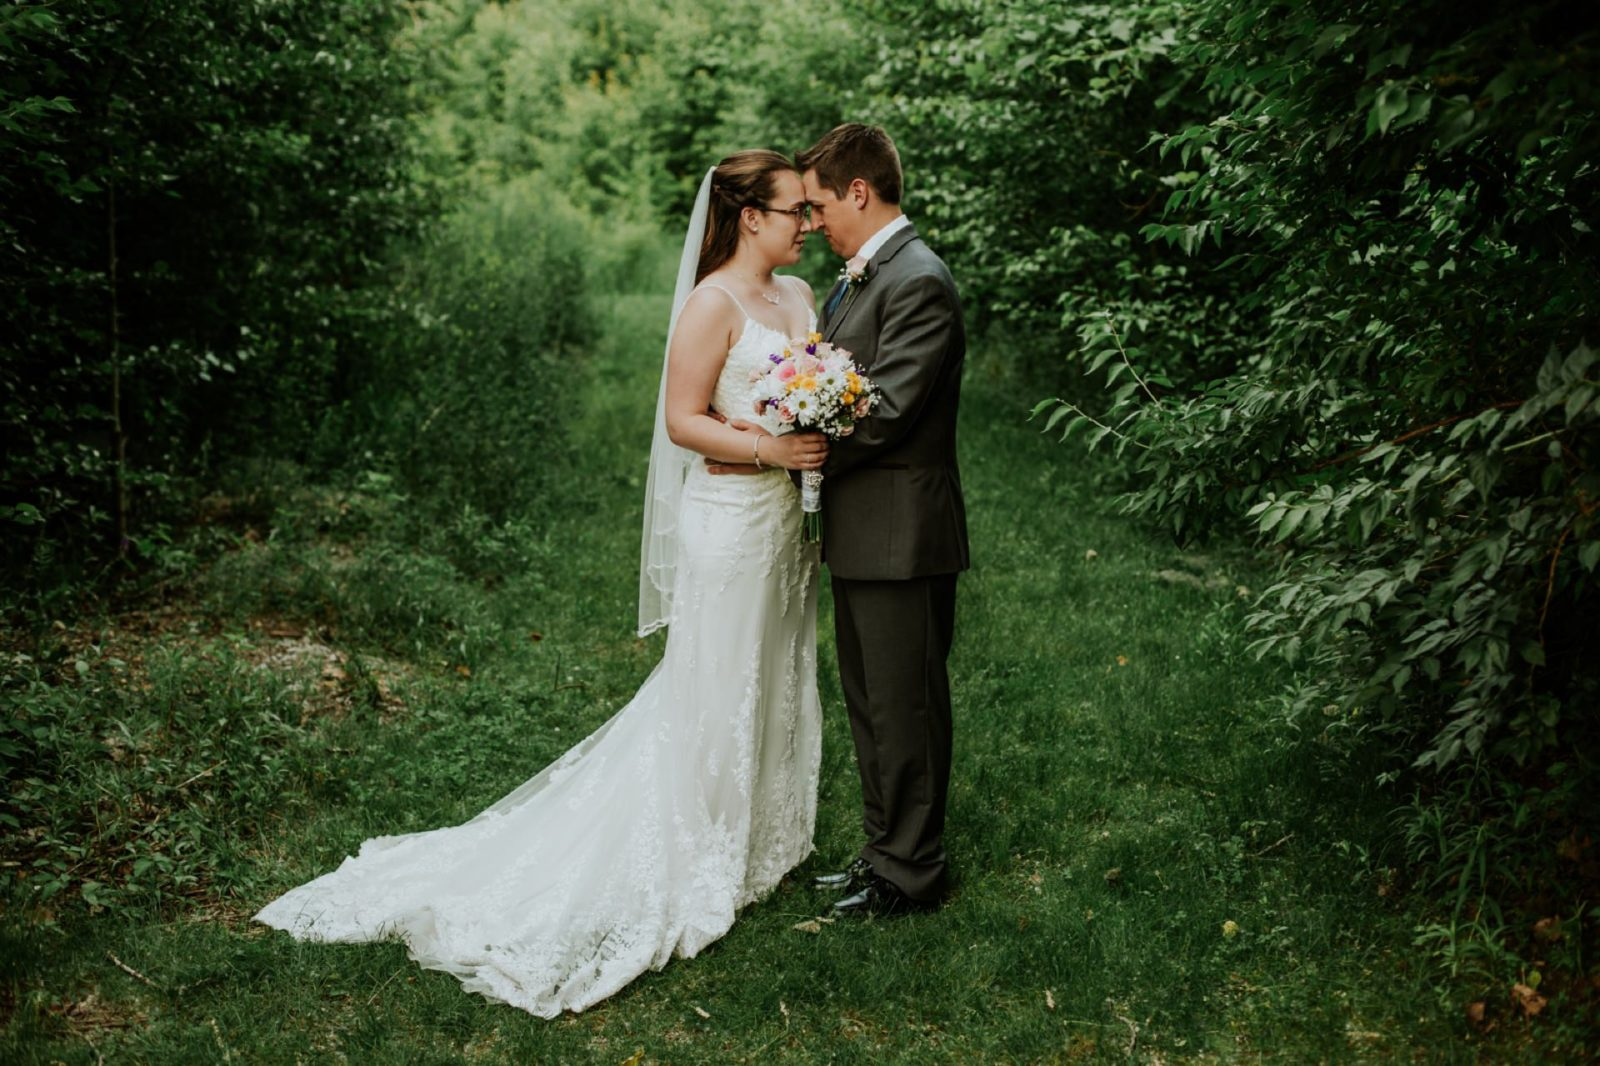 charming-willows-wedding_039-1600x1066.jpg